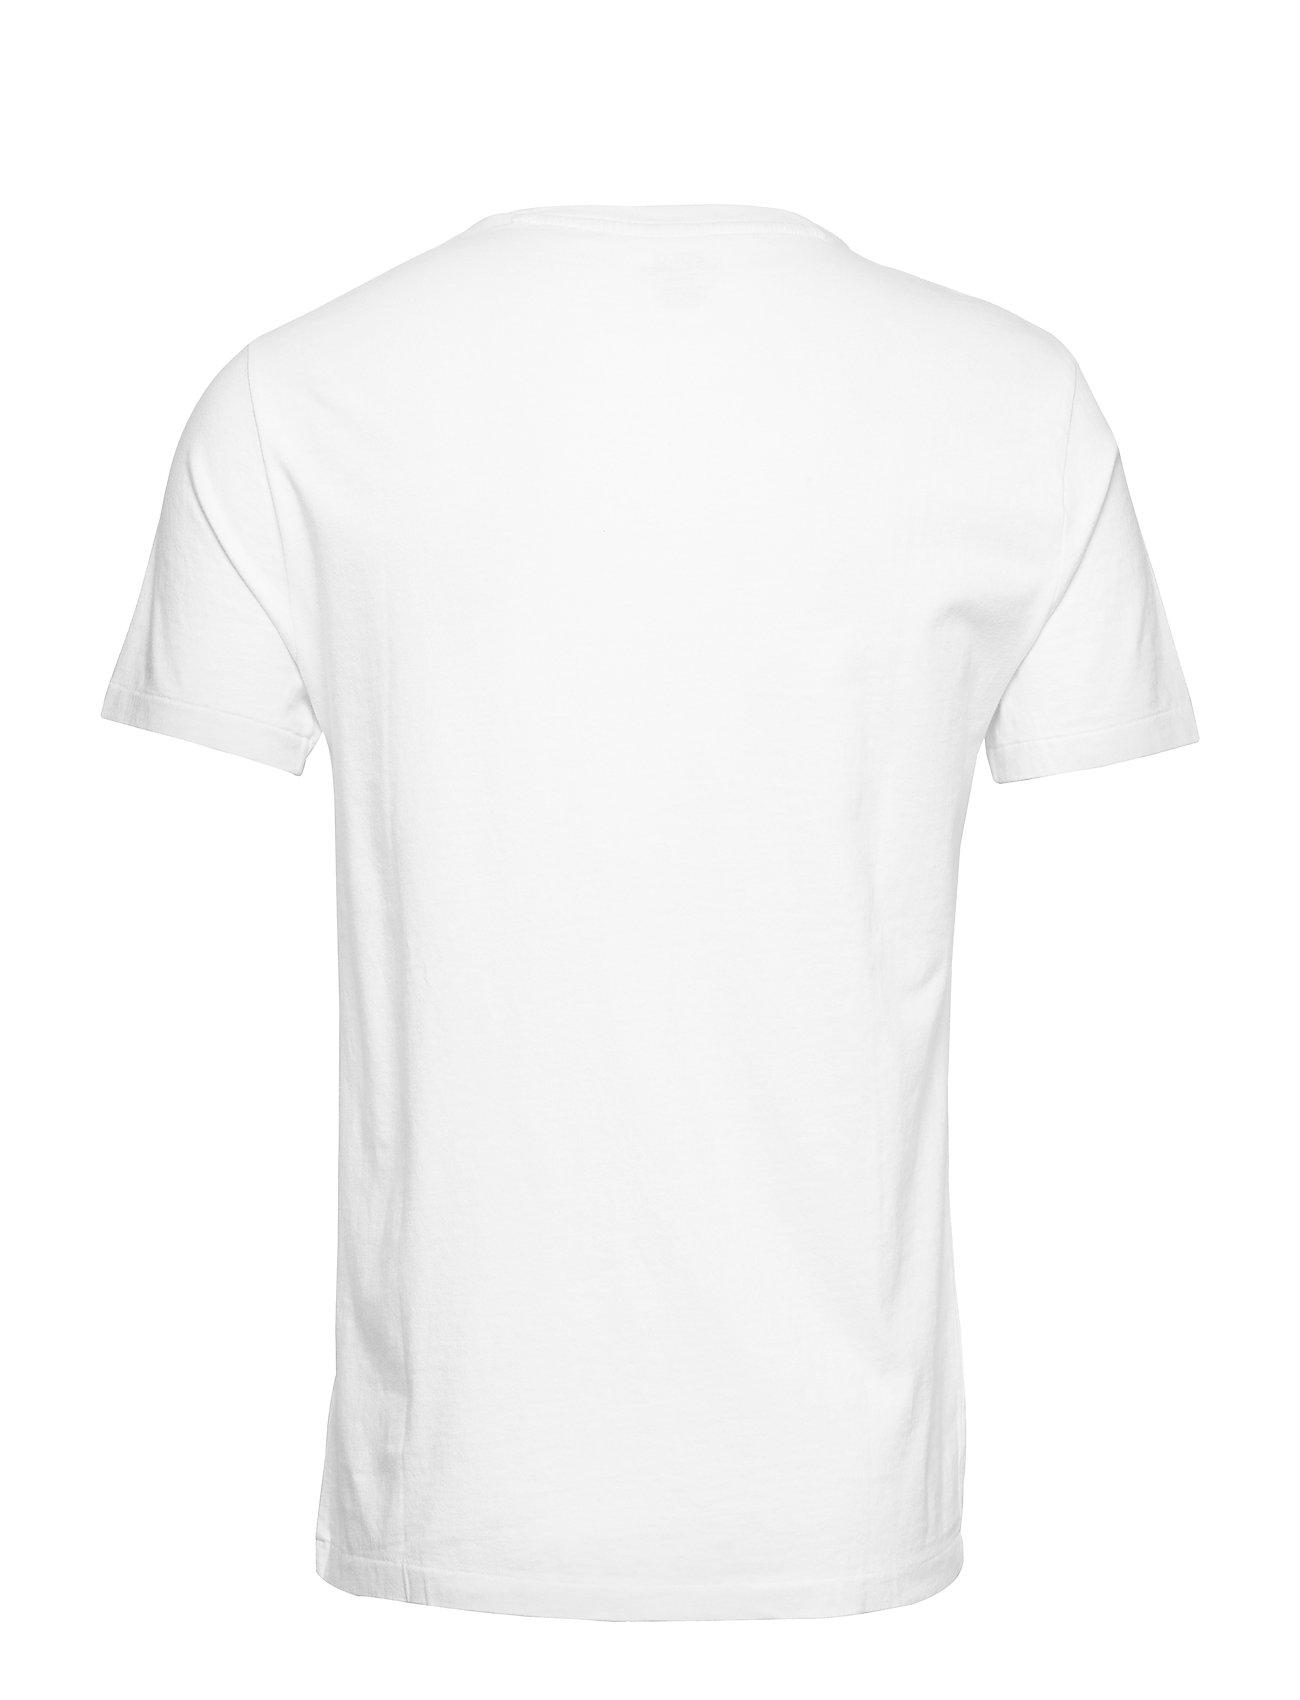 shirtwhitePolo Ralph Cotton Custom Slim T Lauren l1TKFJc